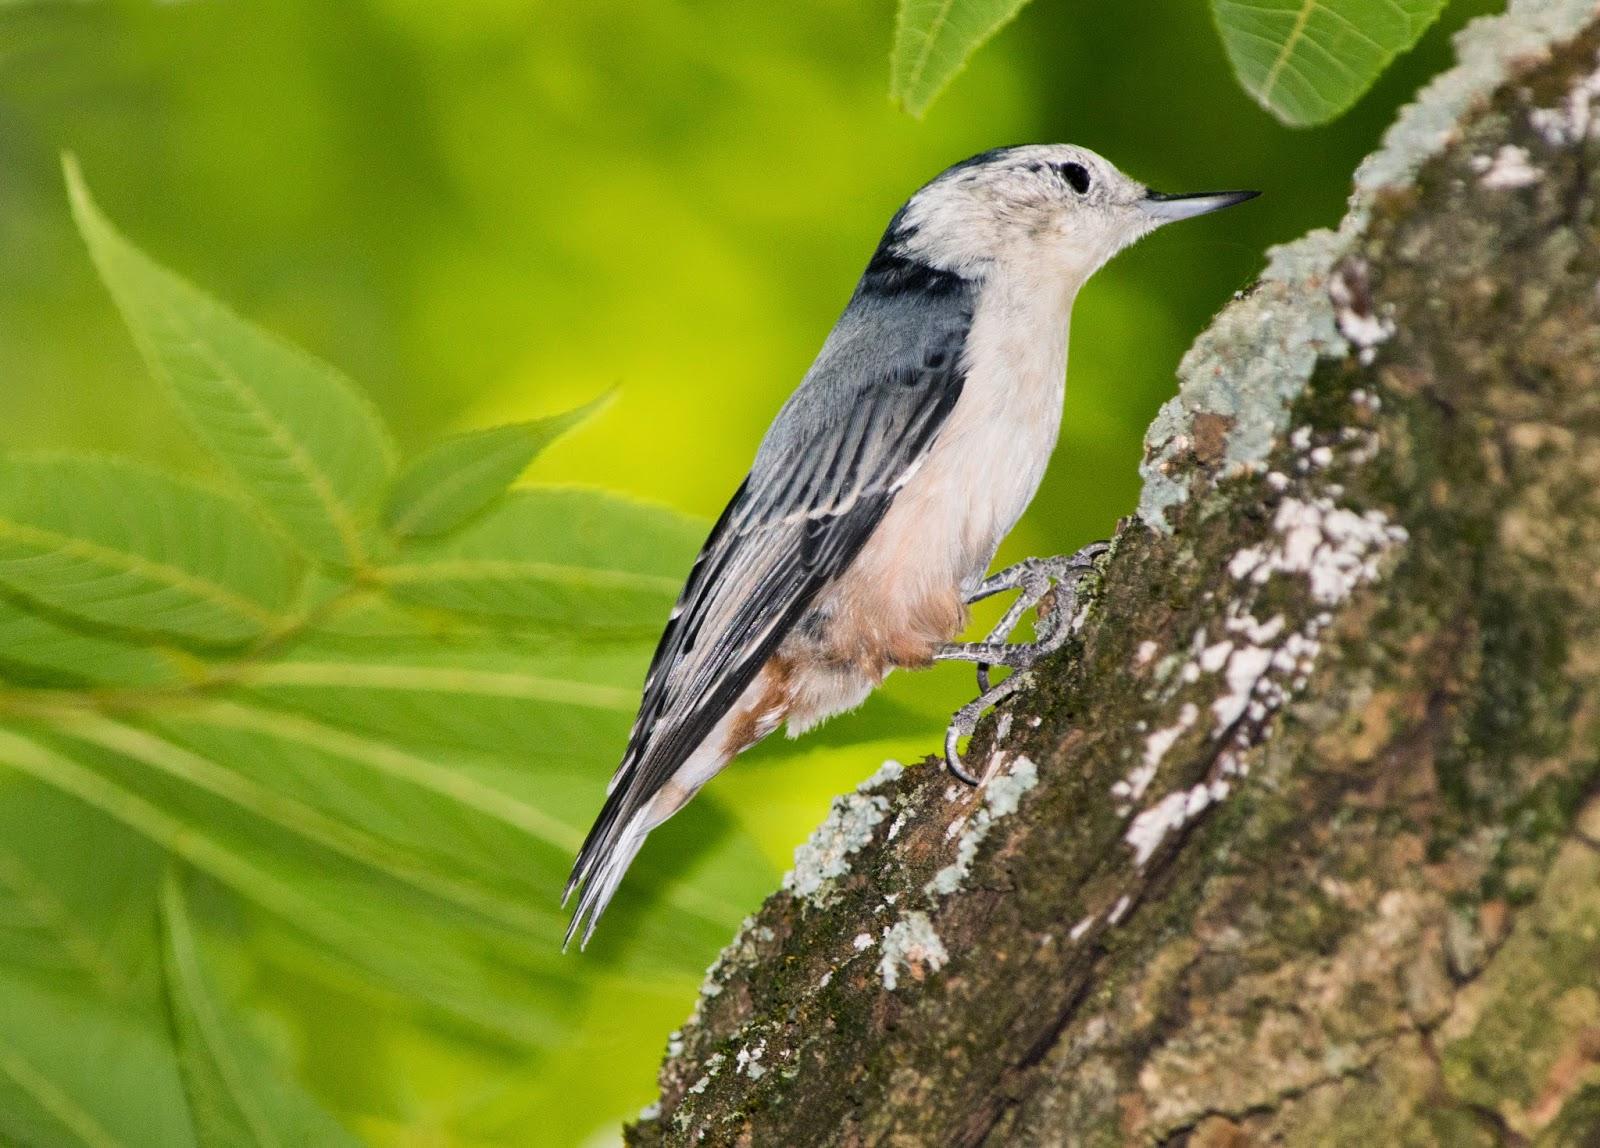 Breanna's Birding Blog: Backyard Birds, Maryland - August ...